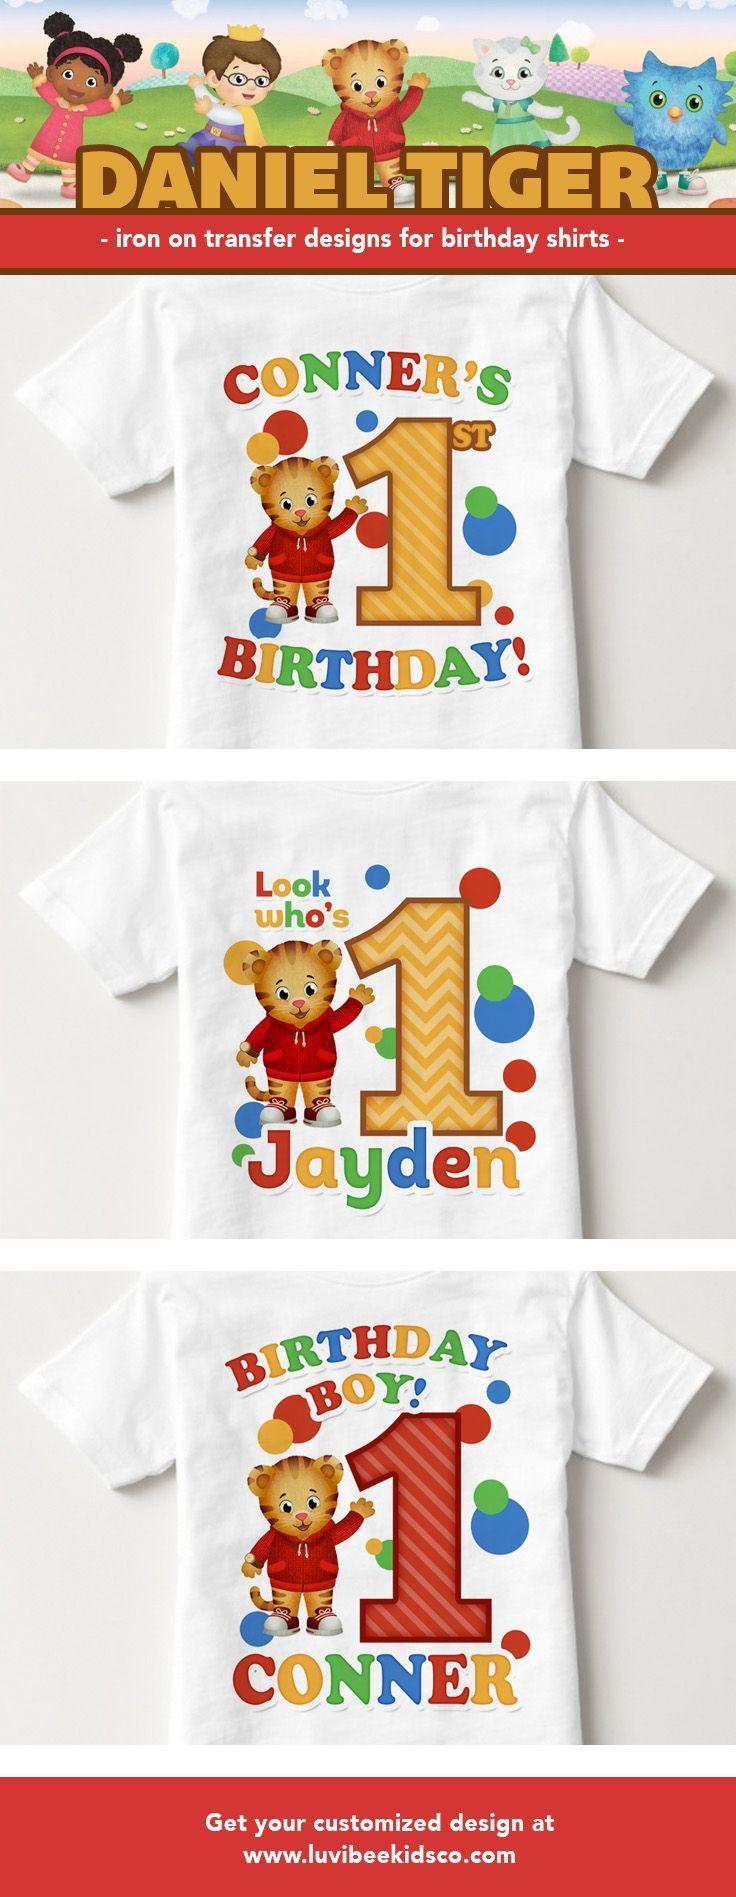 83 best Rylan 2 images on Pinterest | Birthdays, Daniel tiger ...